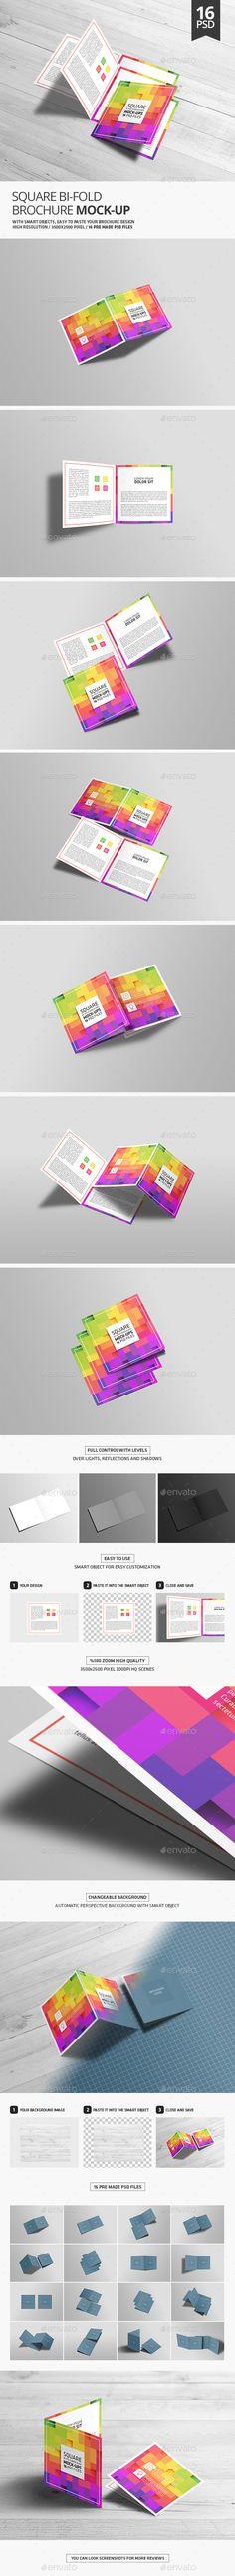 Square BiFold Brochure Mock-Up — Photoshop PSD #mockups #template • Download ➝ https://graphicriver.net/item/square-bifold-brochure-mockup/19179833?ref=pxcr